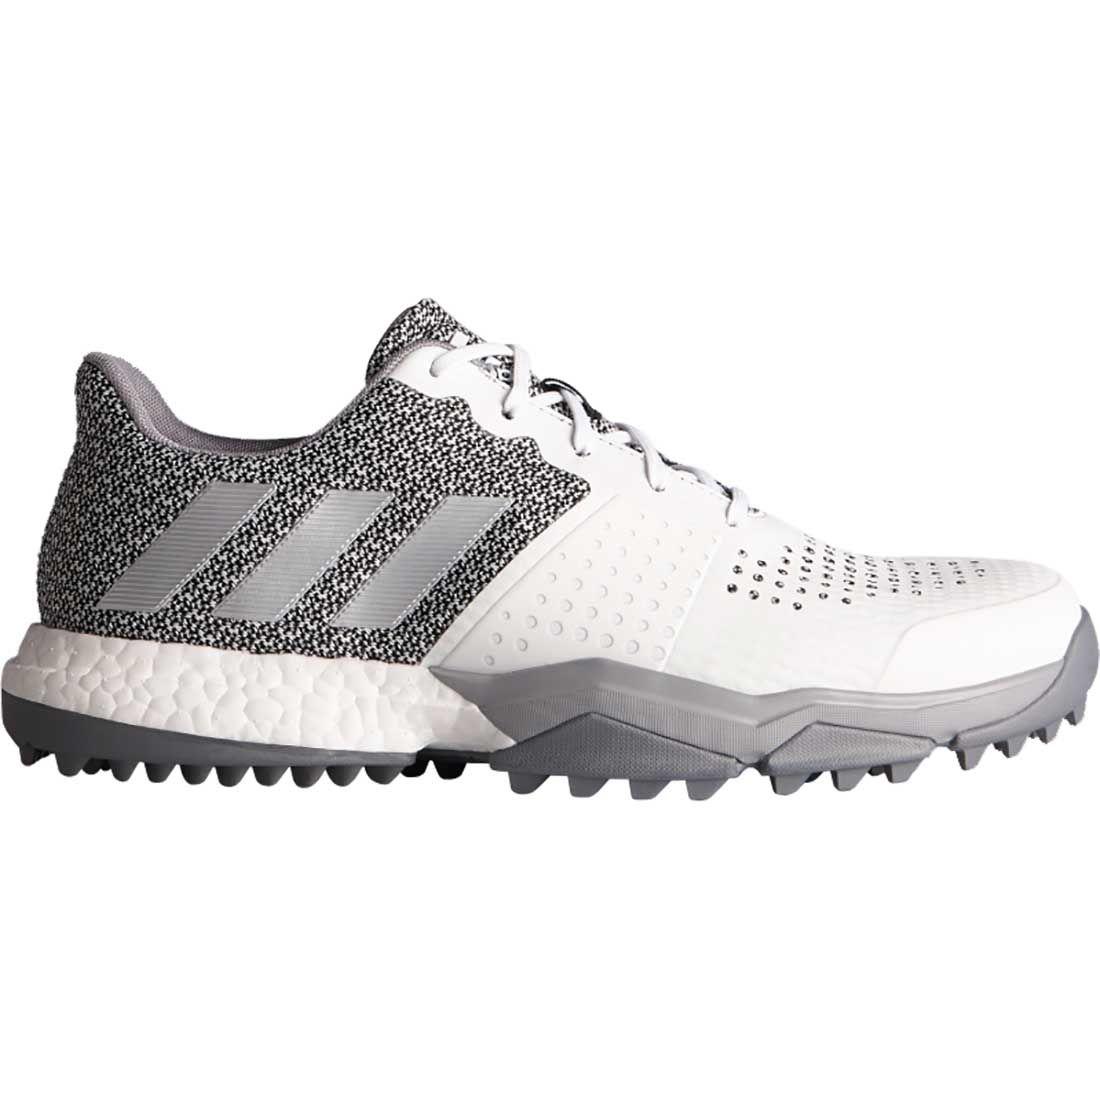 Buy Adidas AdiPower Sport Boost 3 Golf Shoes White/Grey   Golf ...